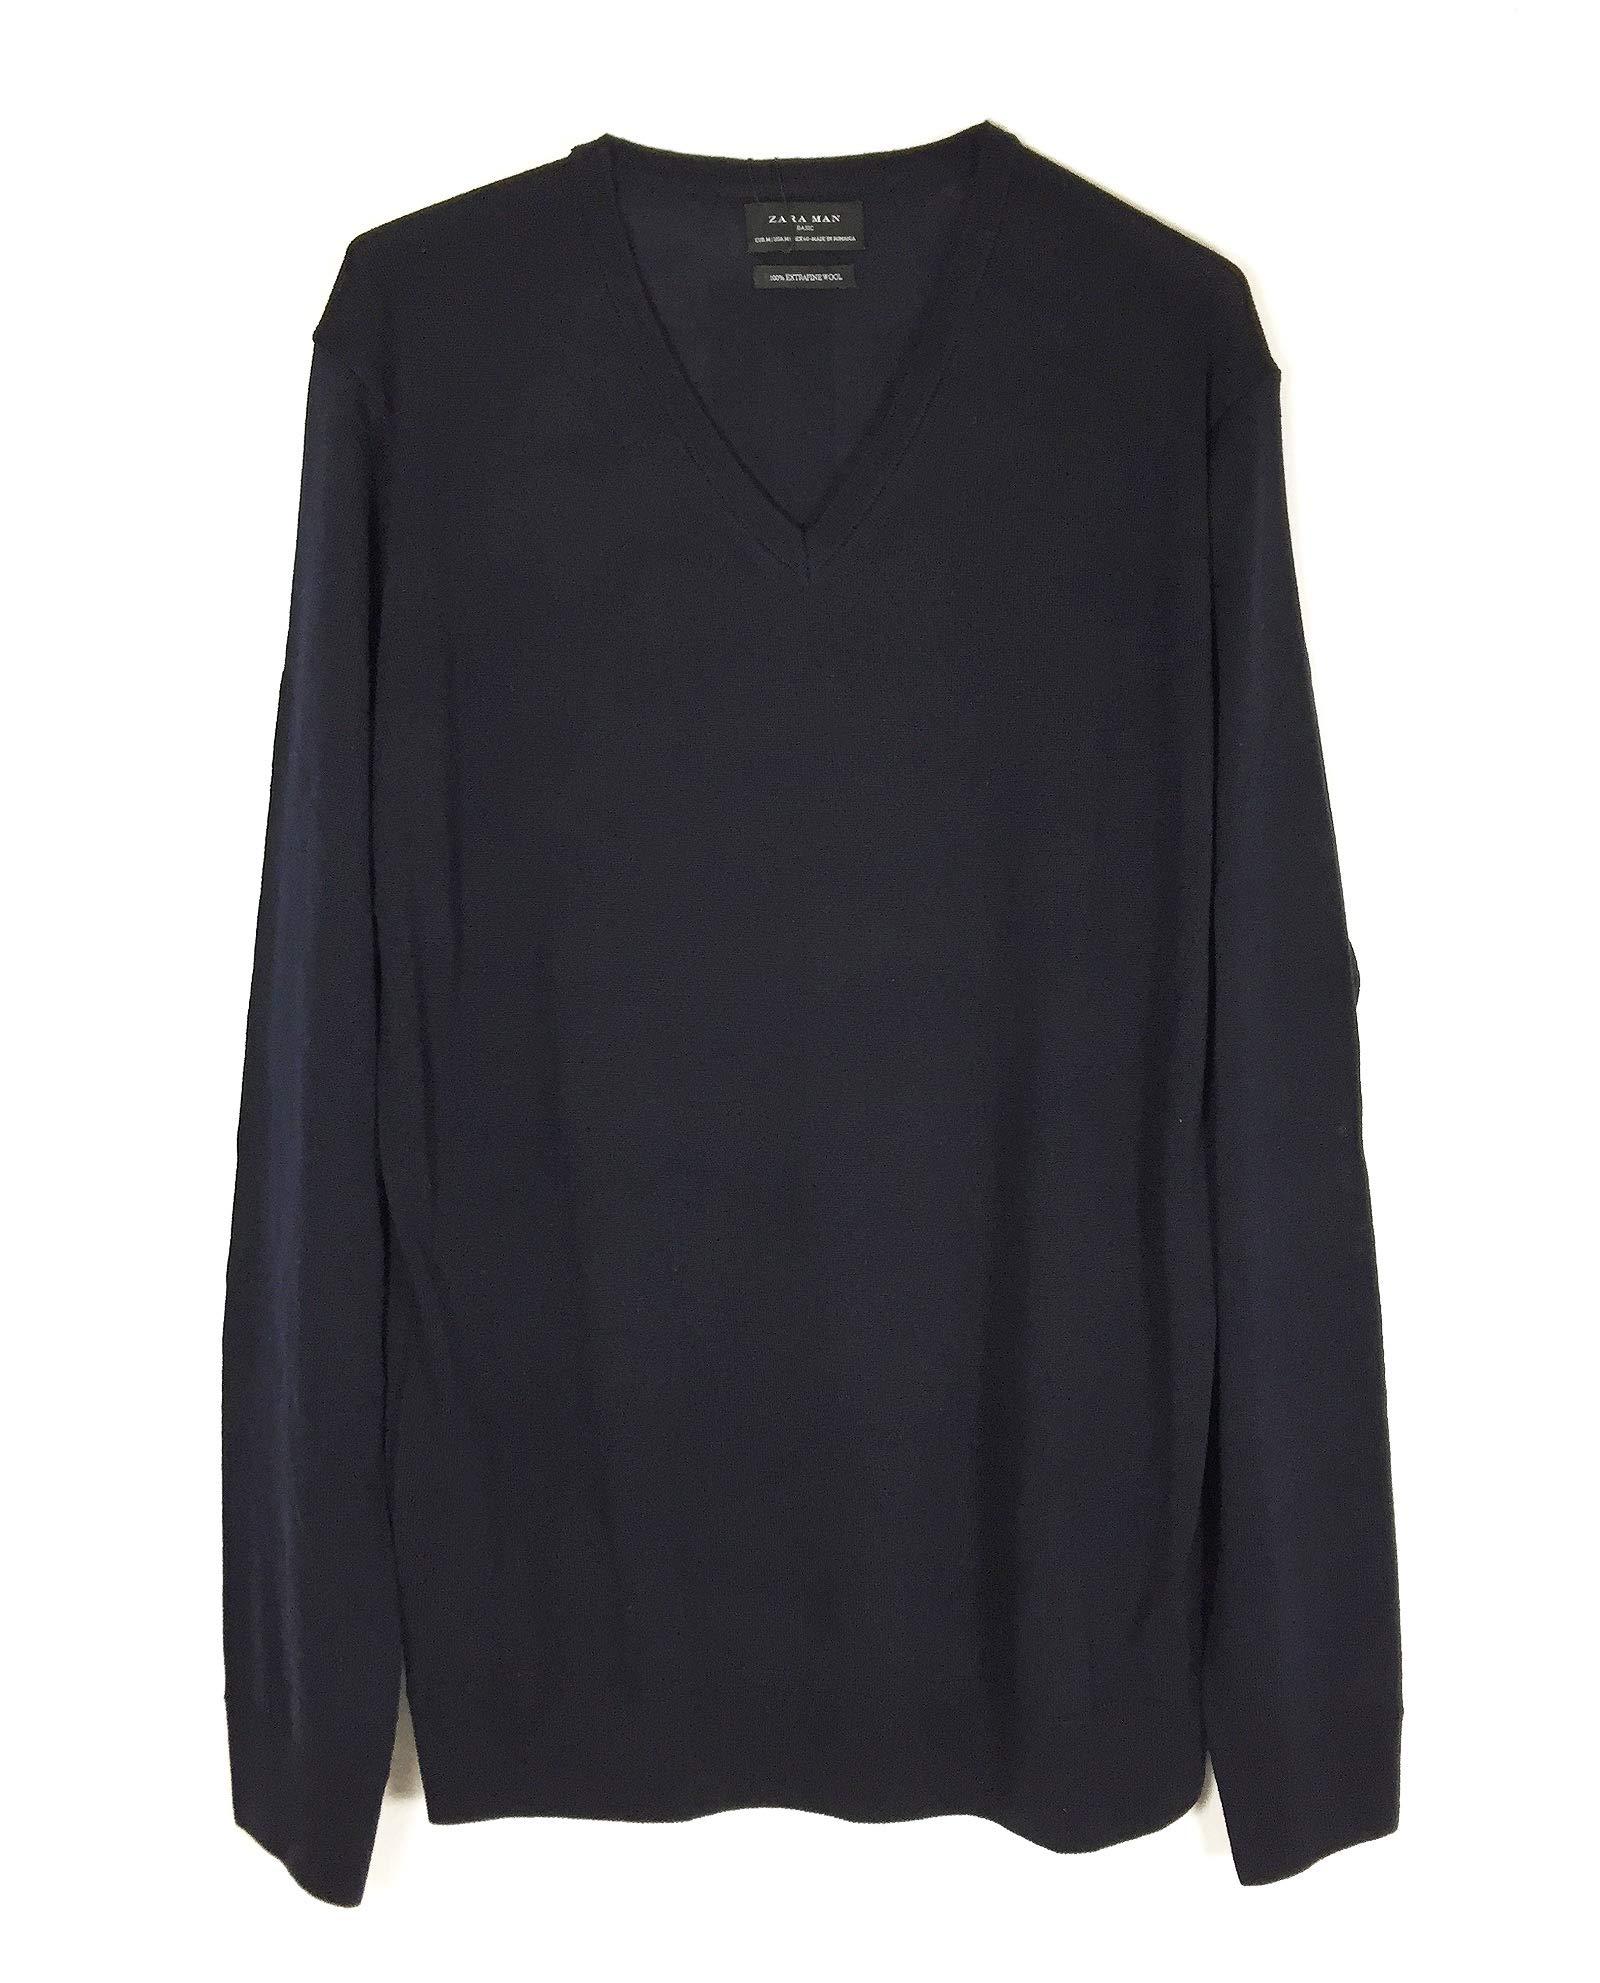 Zara Men Fine Wool Sweater 0693/330 (Medium)